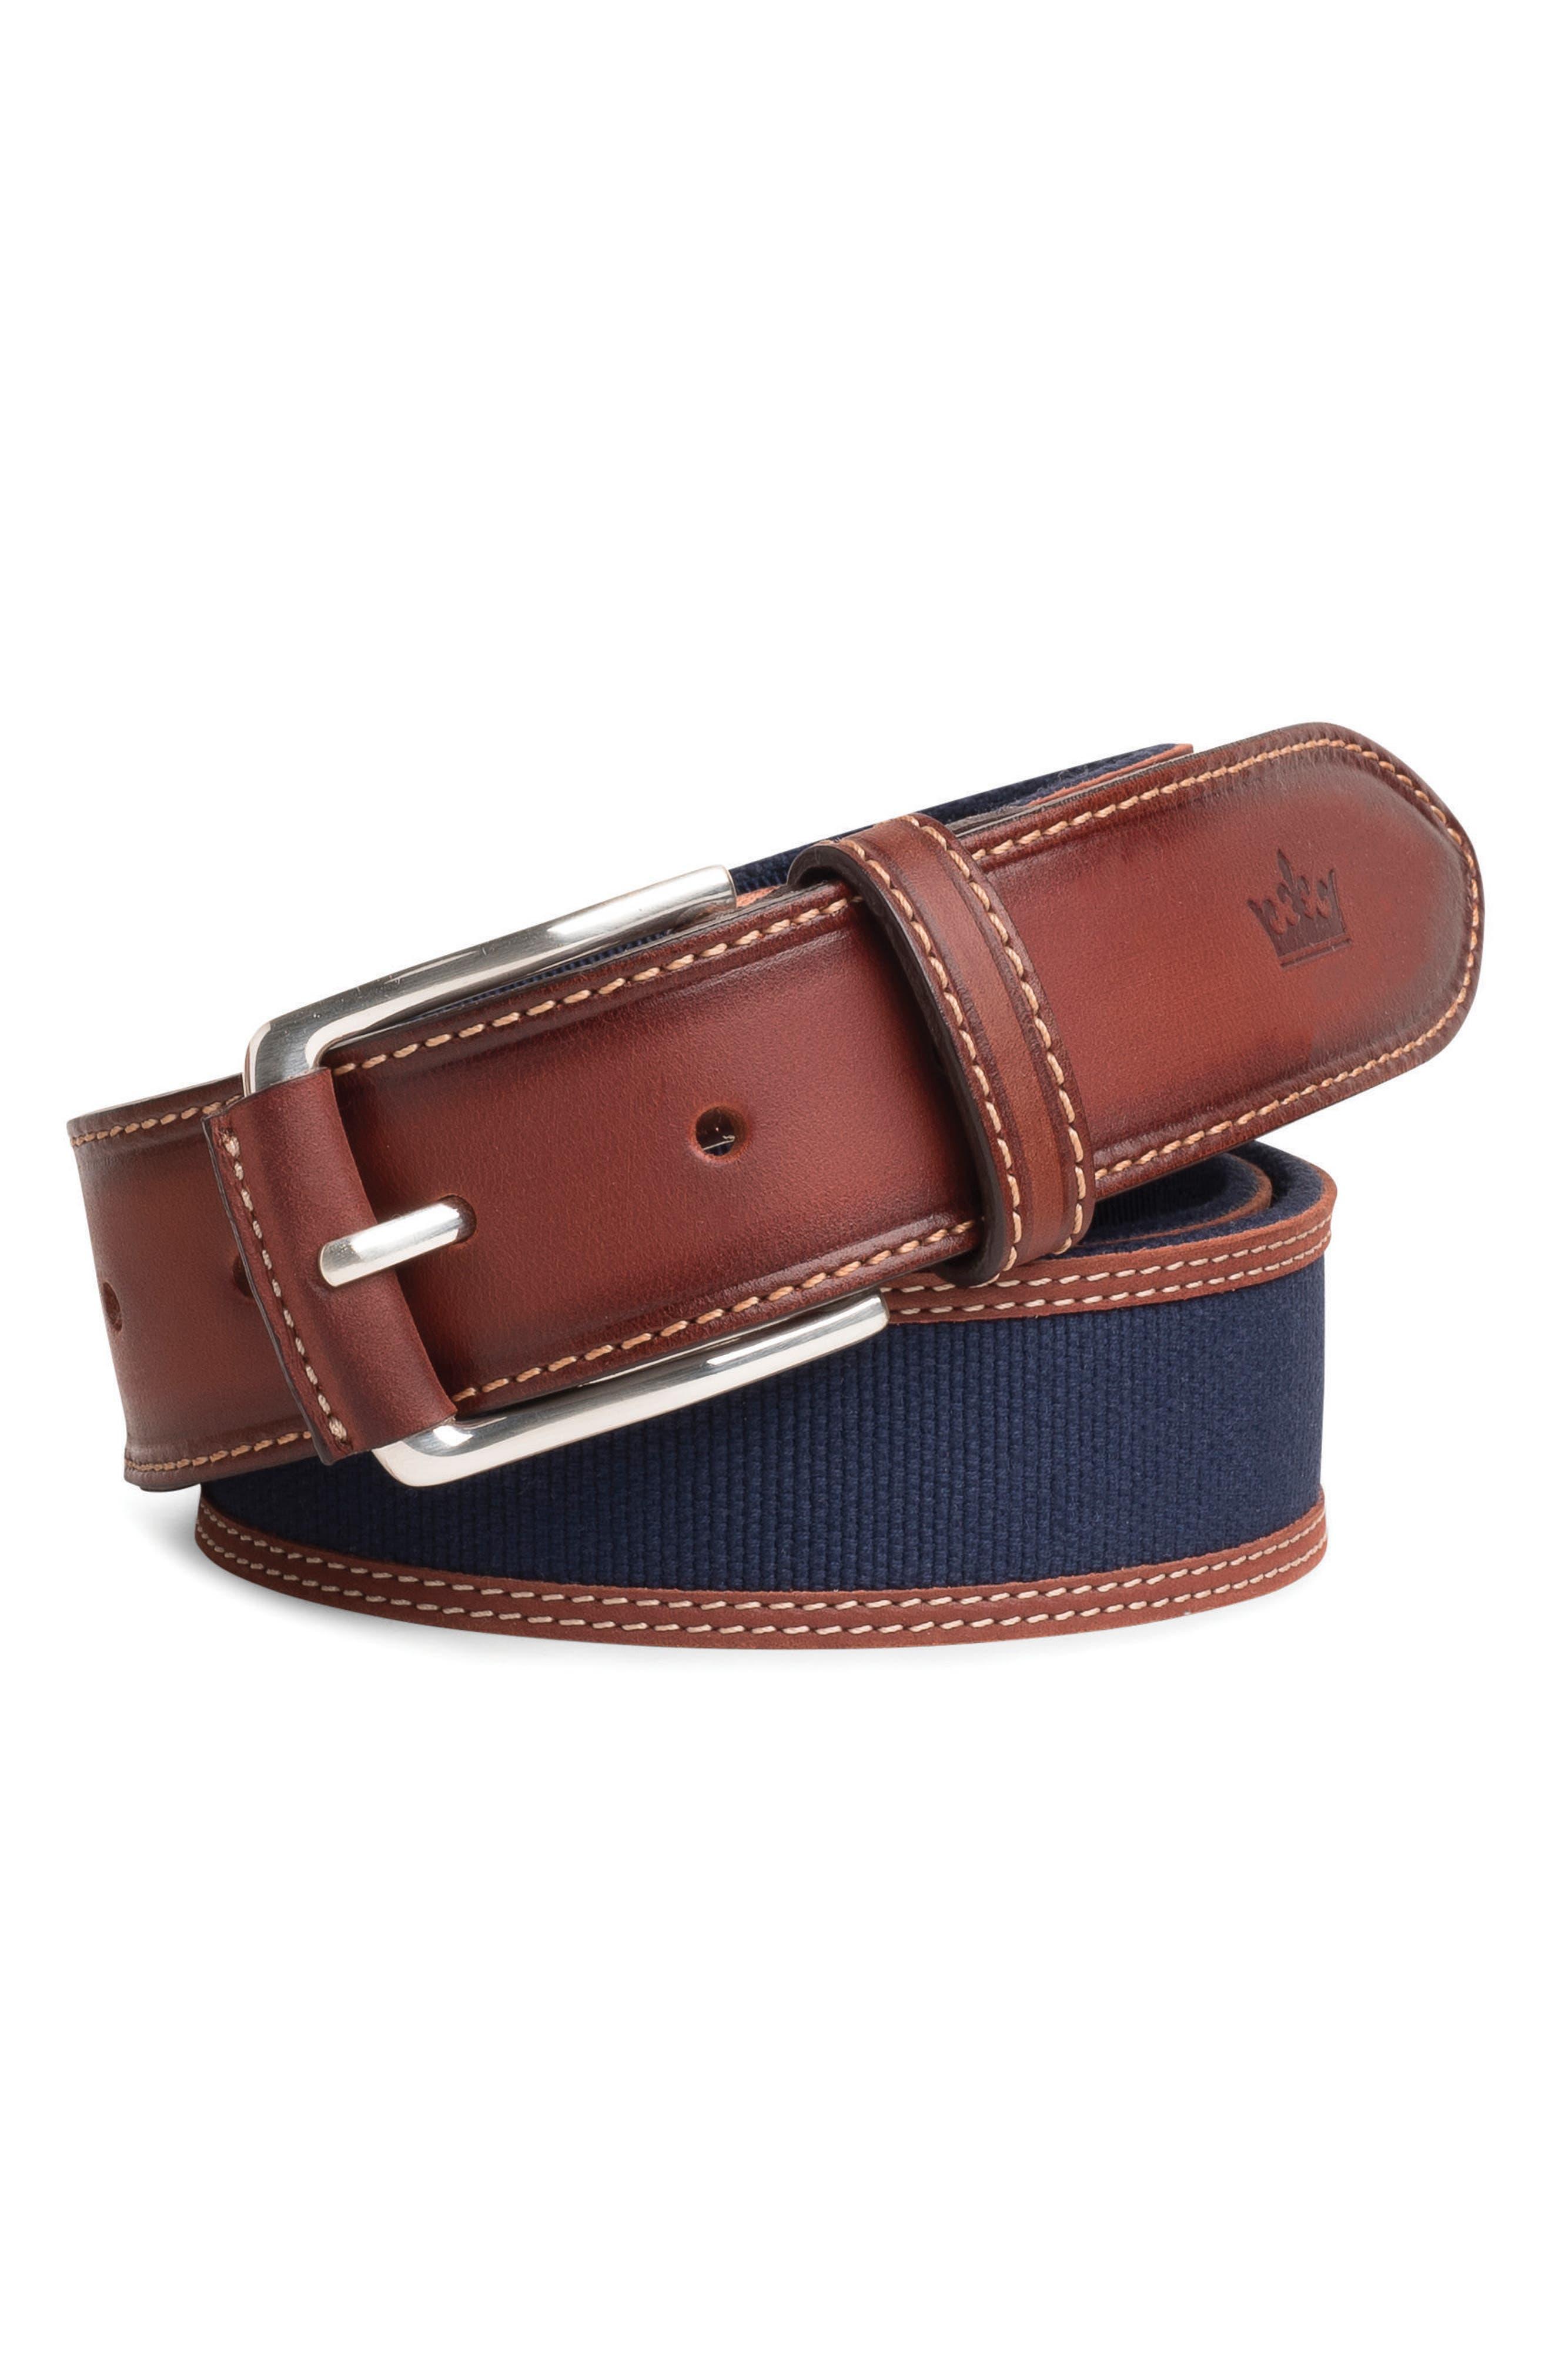 Peter Millar Canvas & Leather Belt